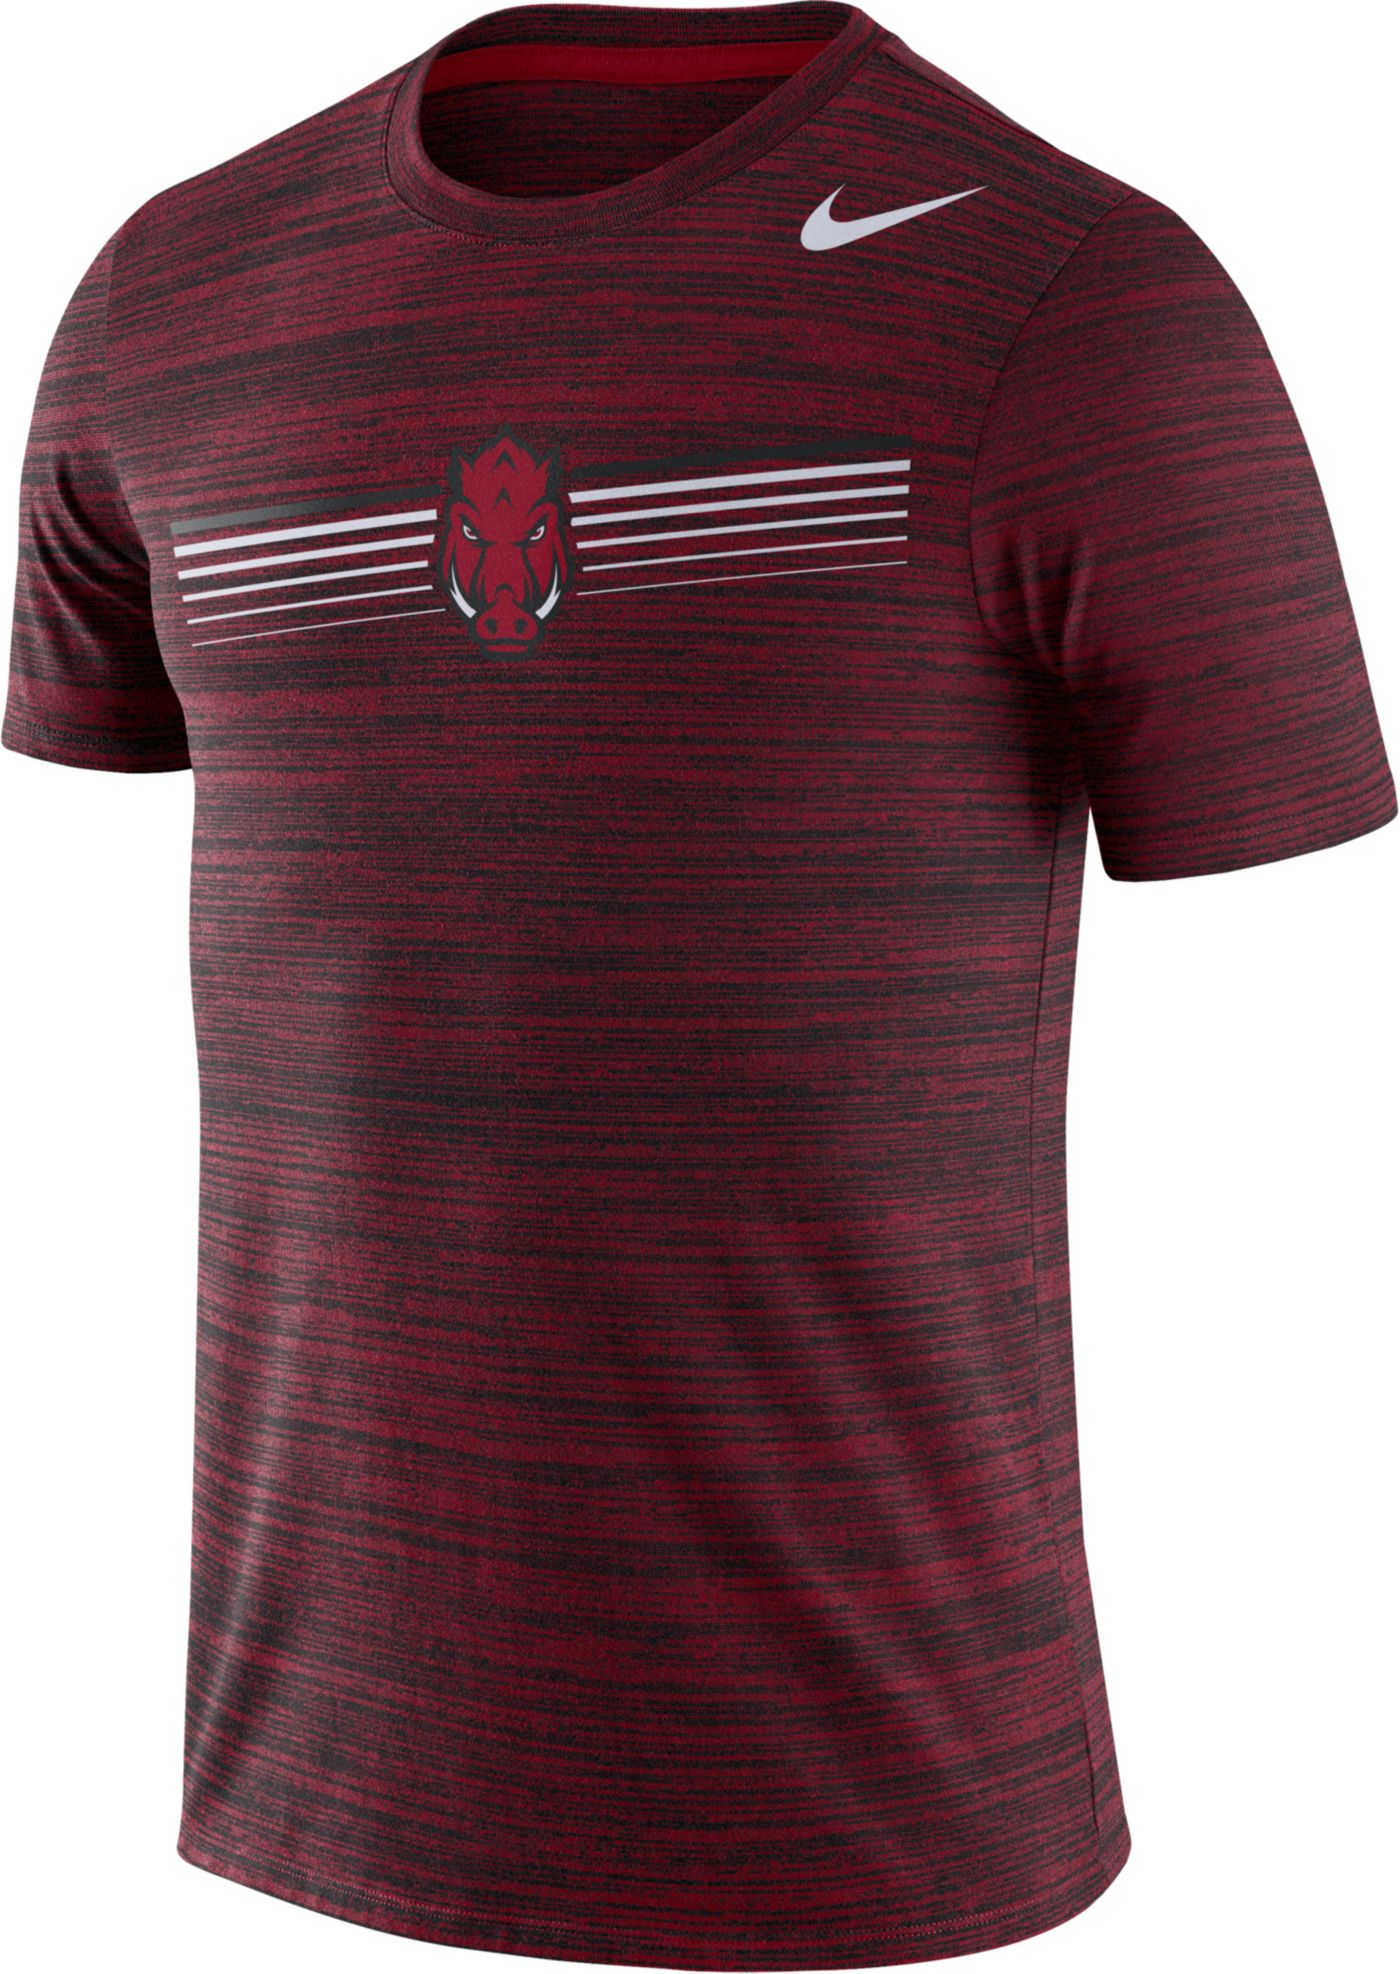 Nike Men's Arkansas Razorbacks Cardinal Velocity Legend Graphic T-Shirt